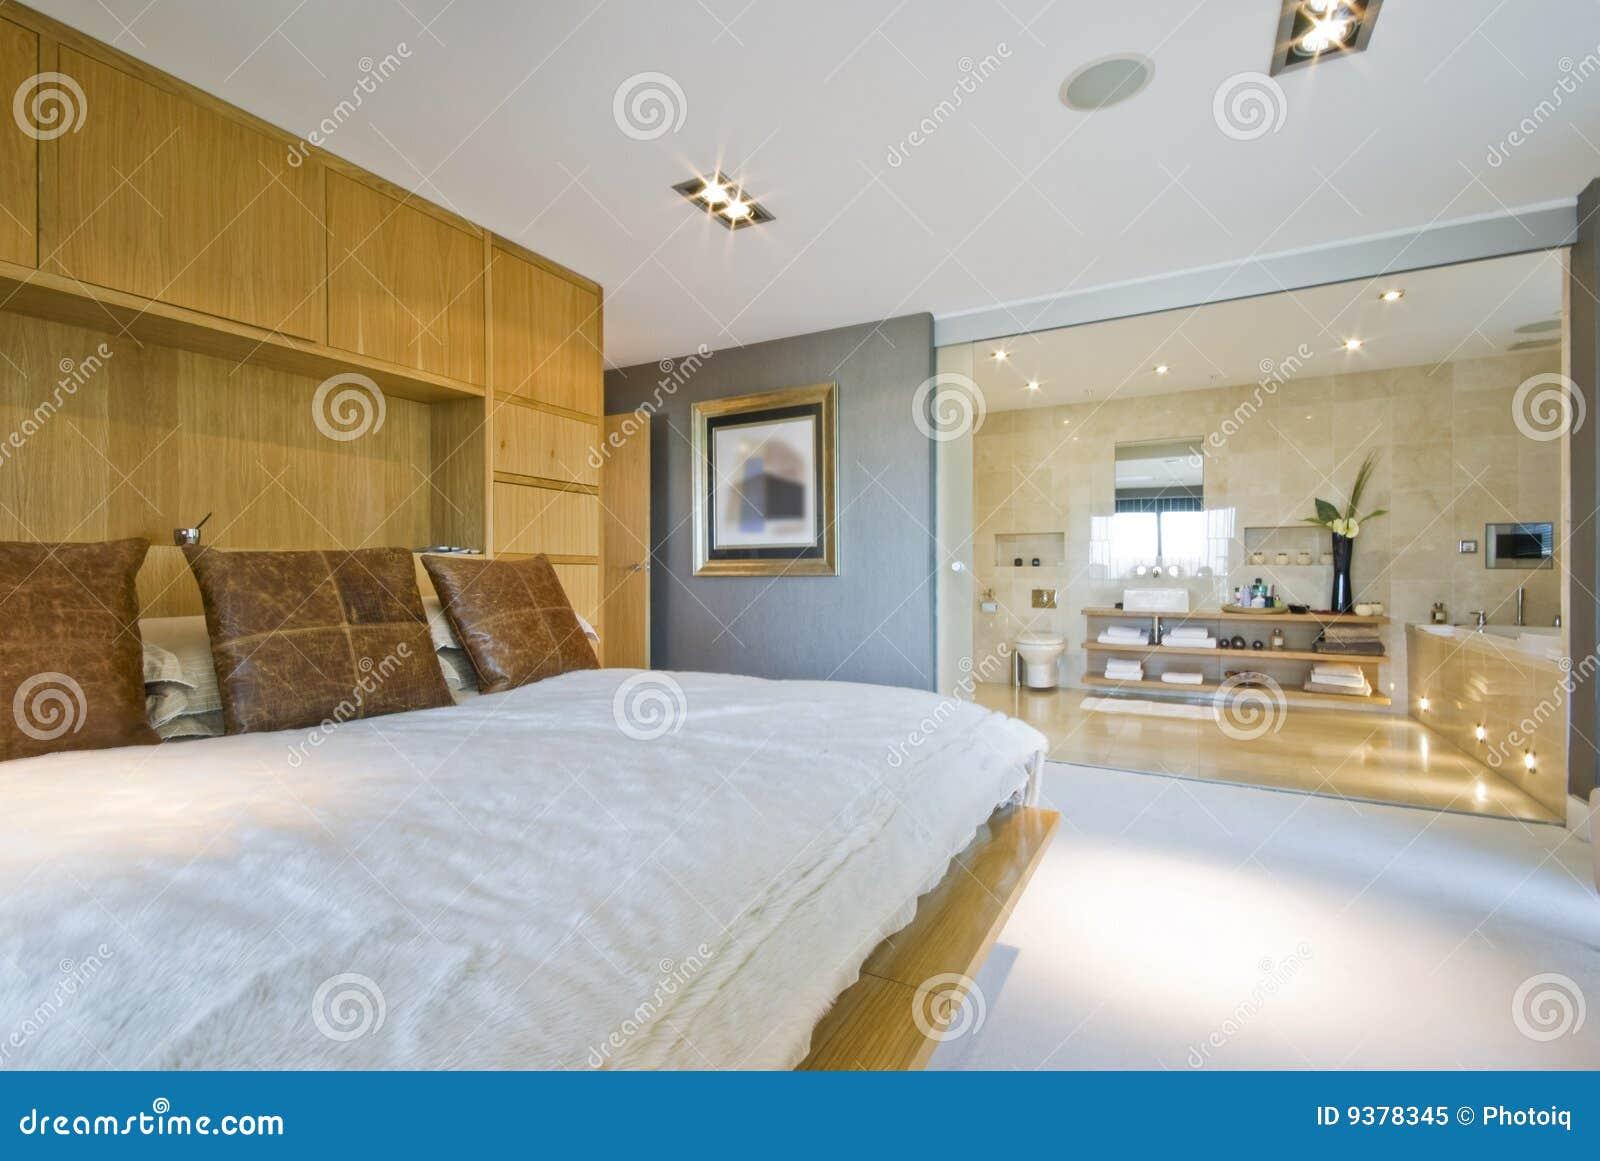 Bedroom En Suite Bathroom: Large Bedroom With En Suite Bathroom Stock Image